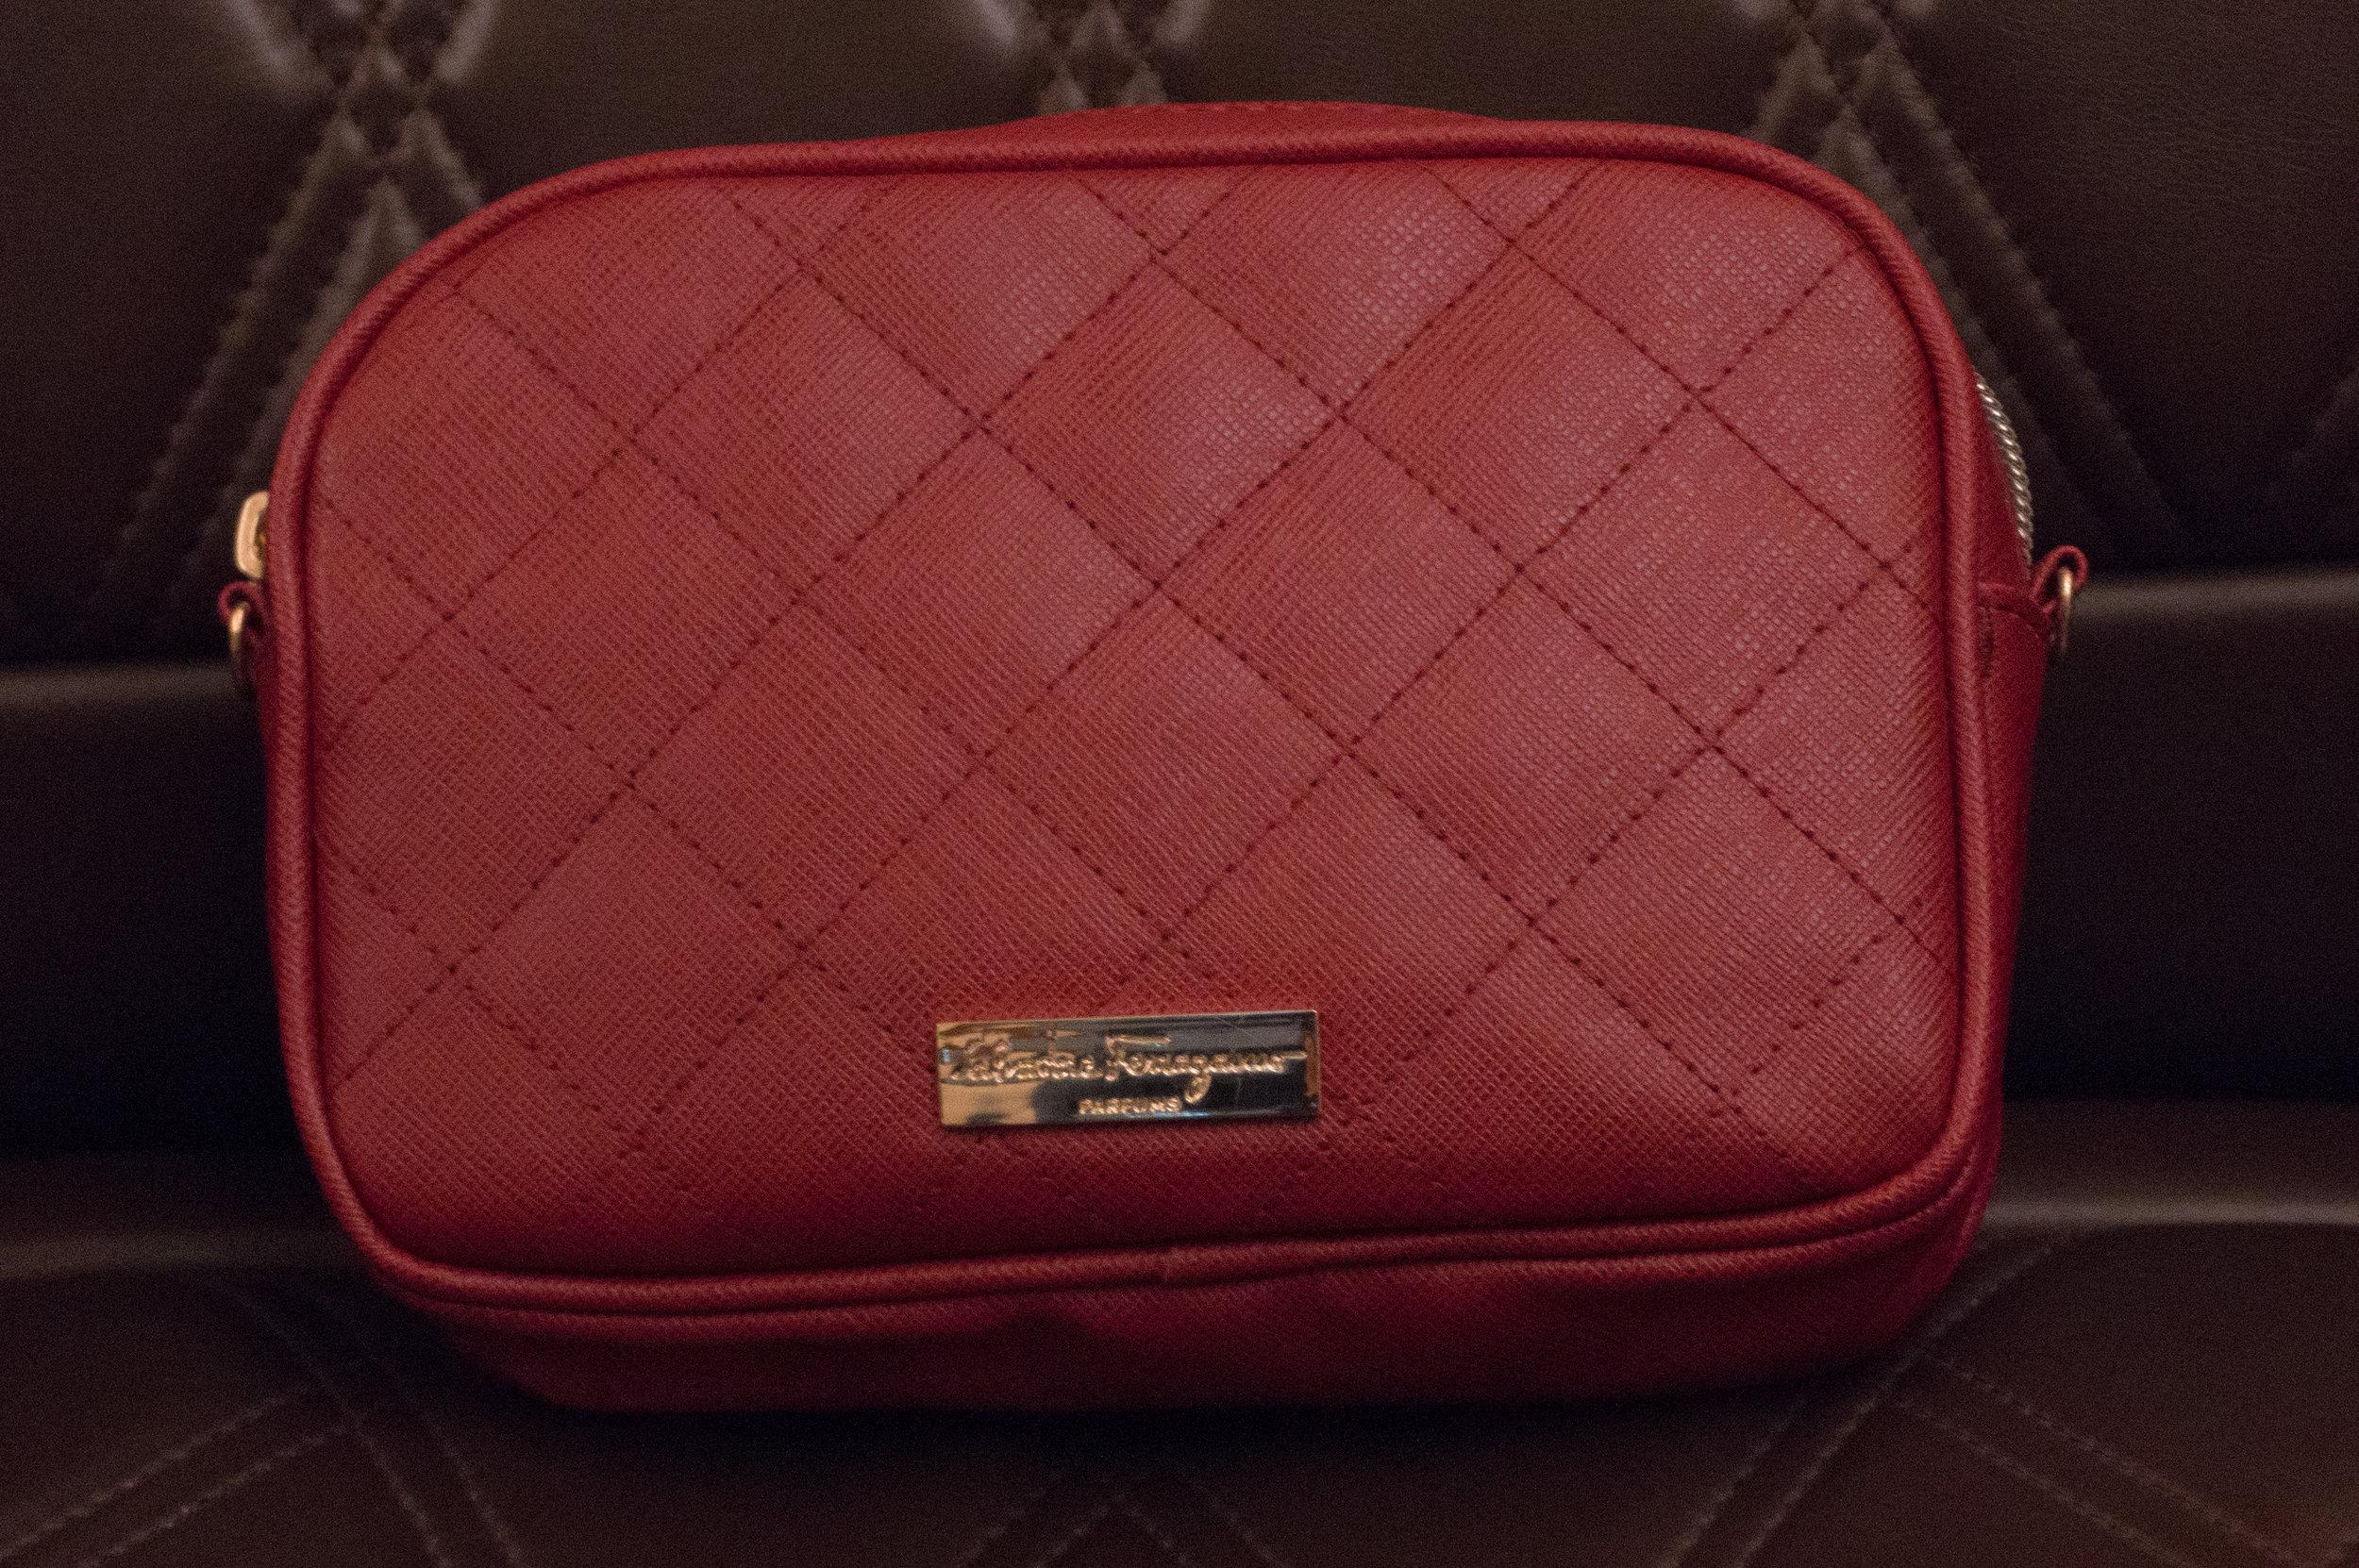 Women's Ferragamo Amenity Kit